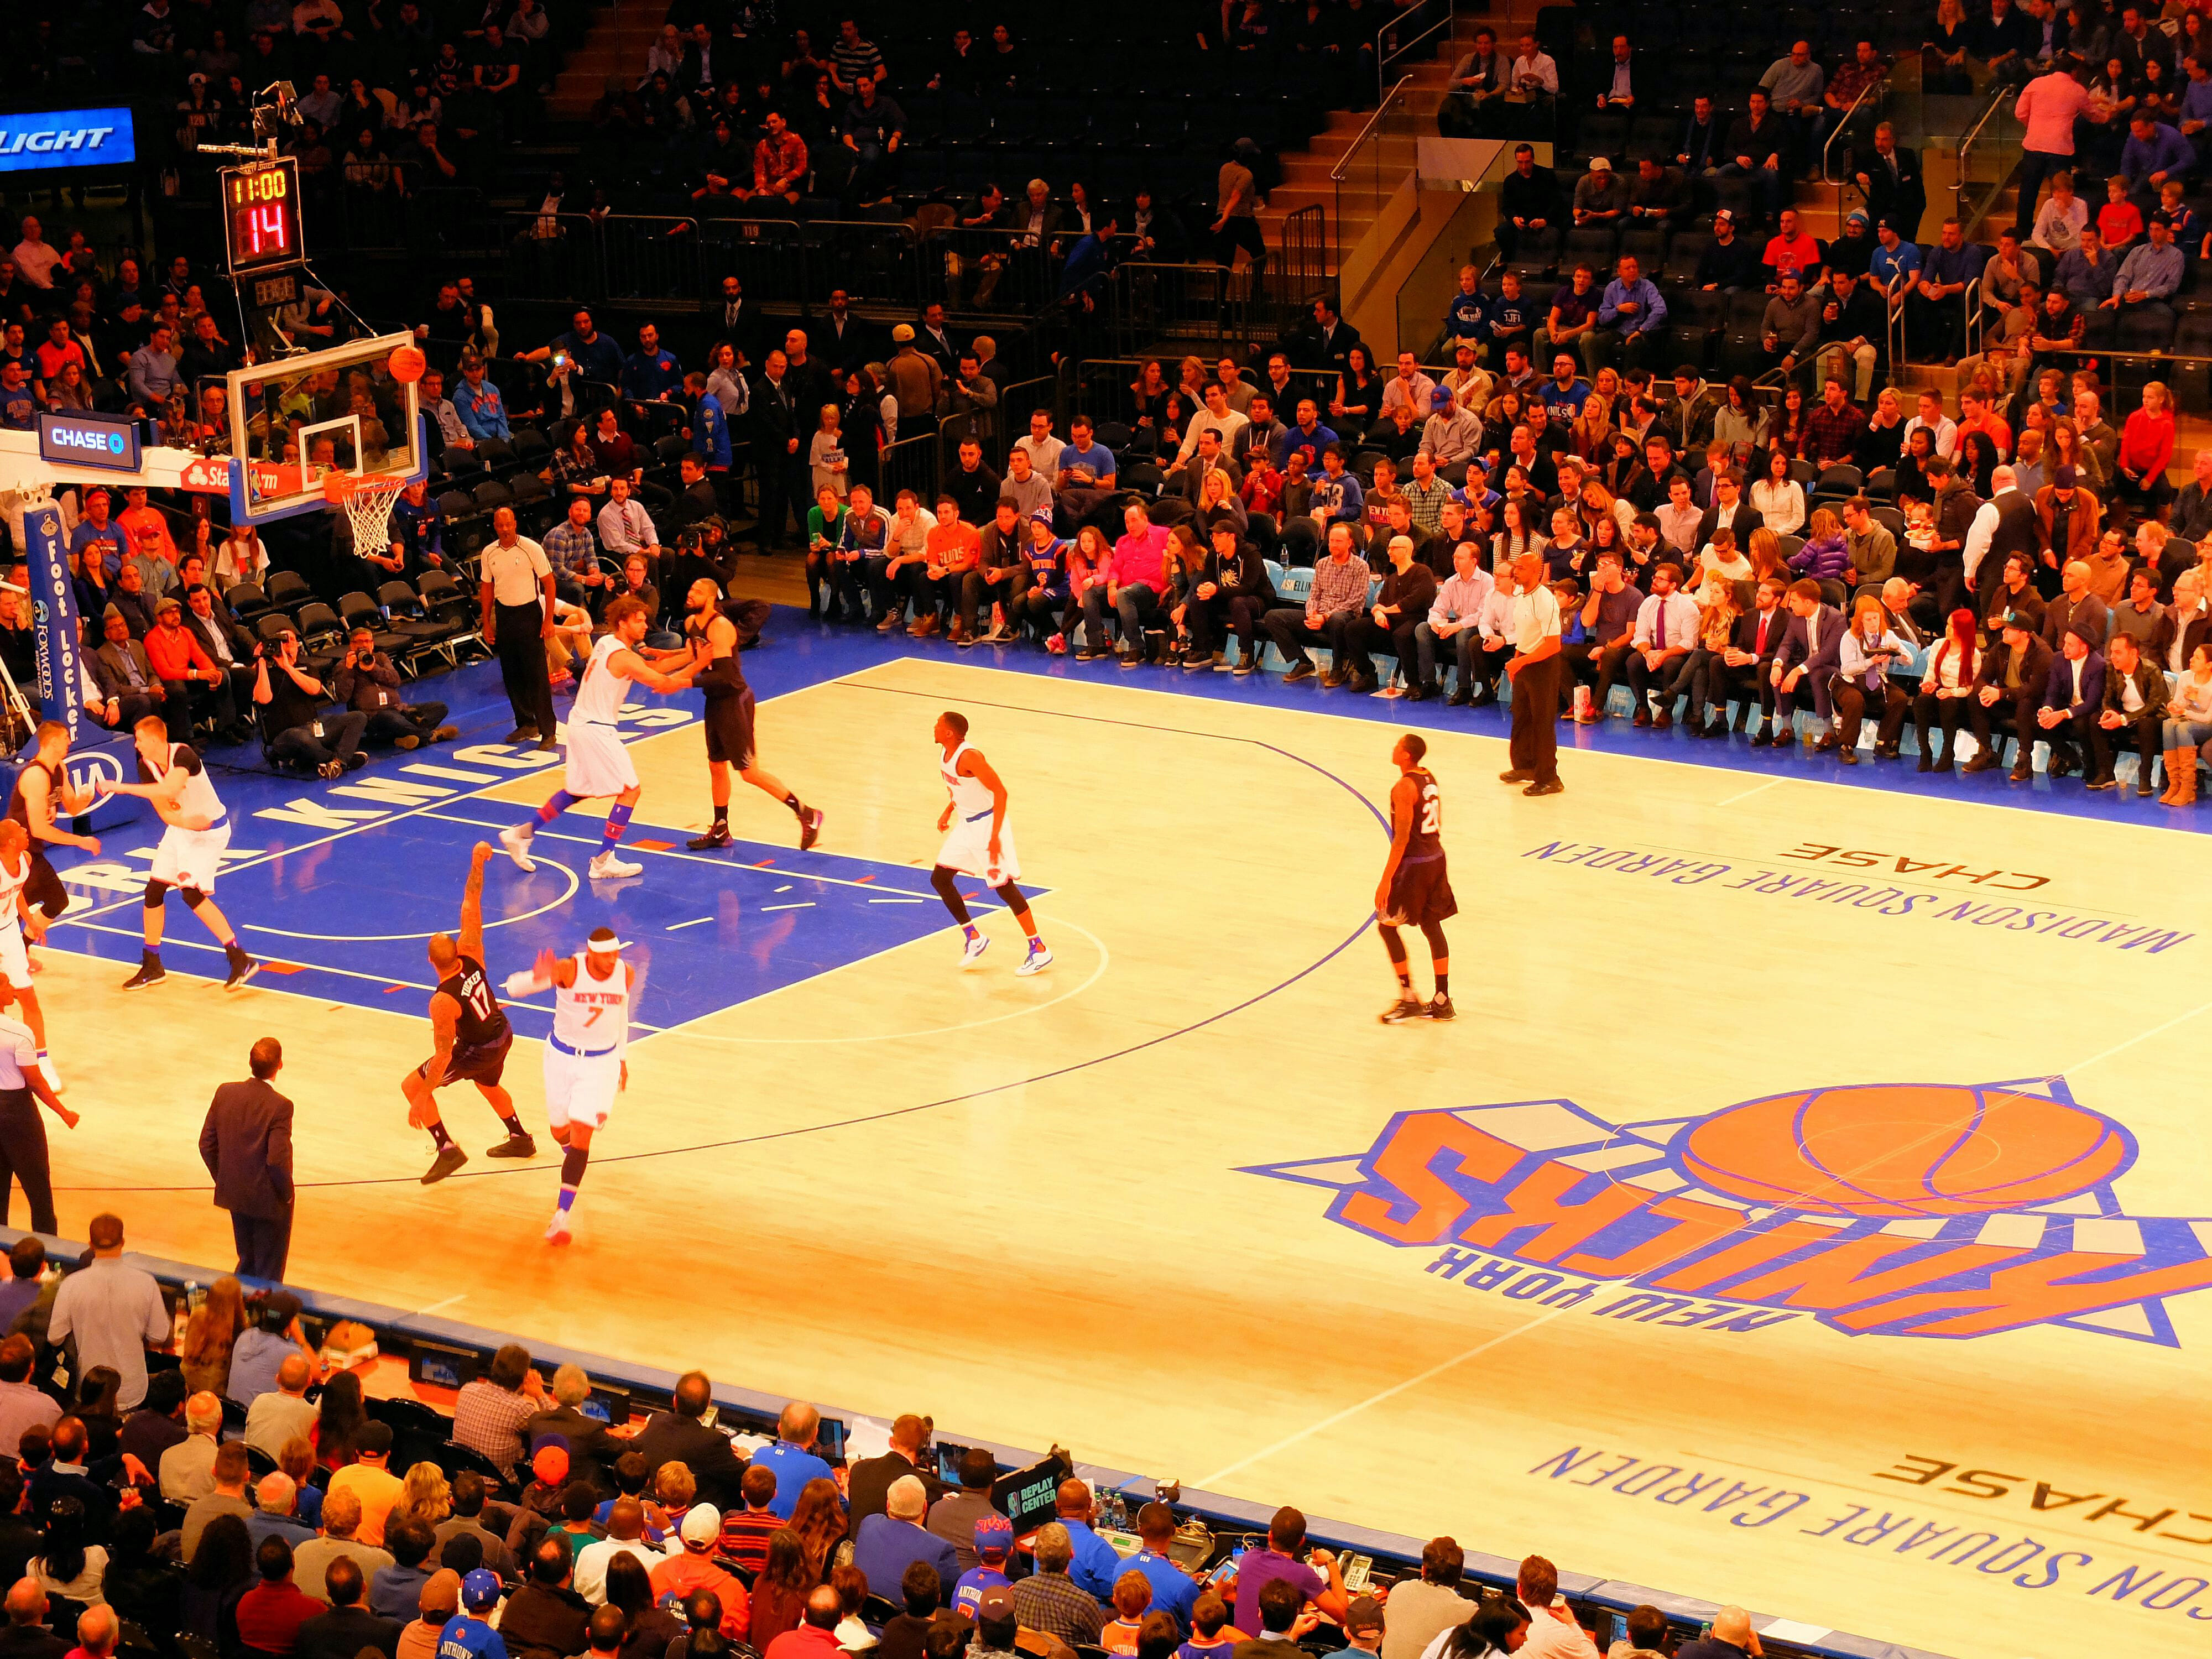 New York Knicks Basketball High Quality Wallpaper